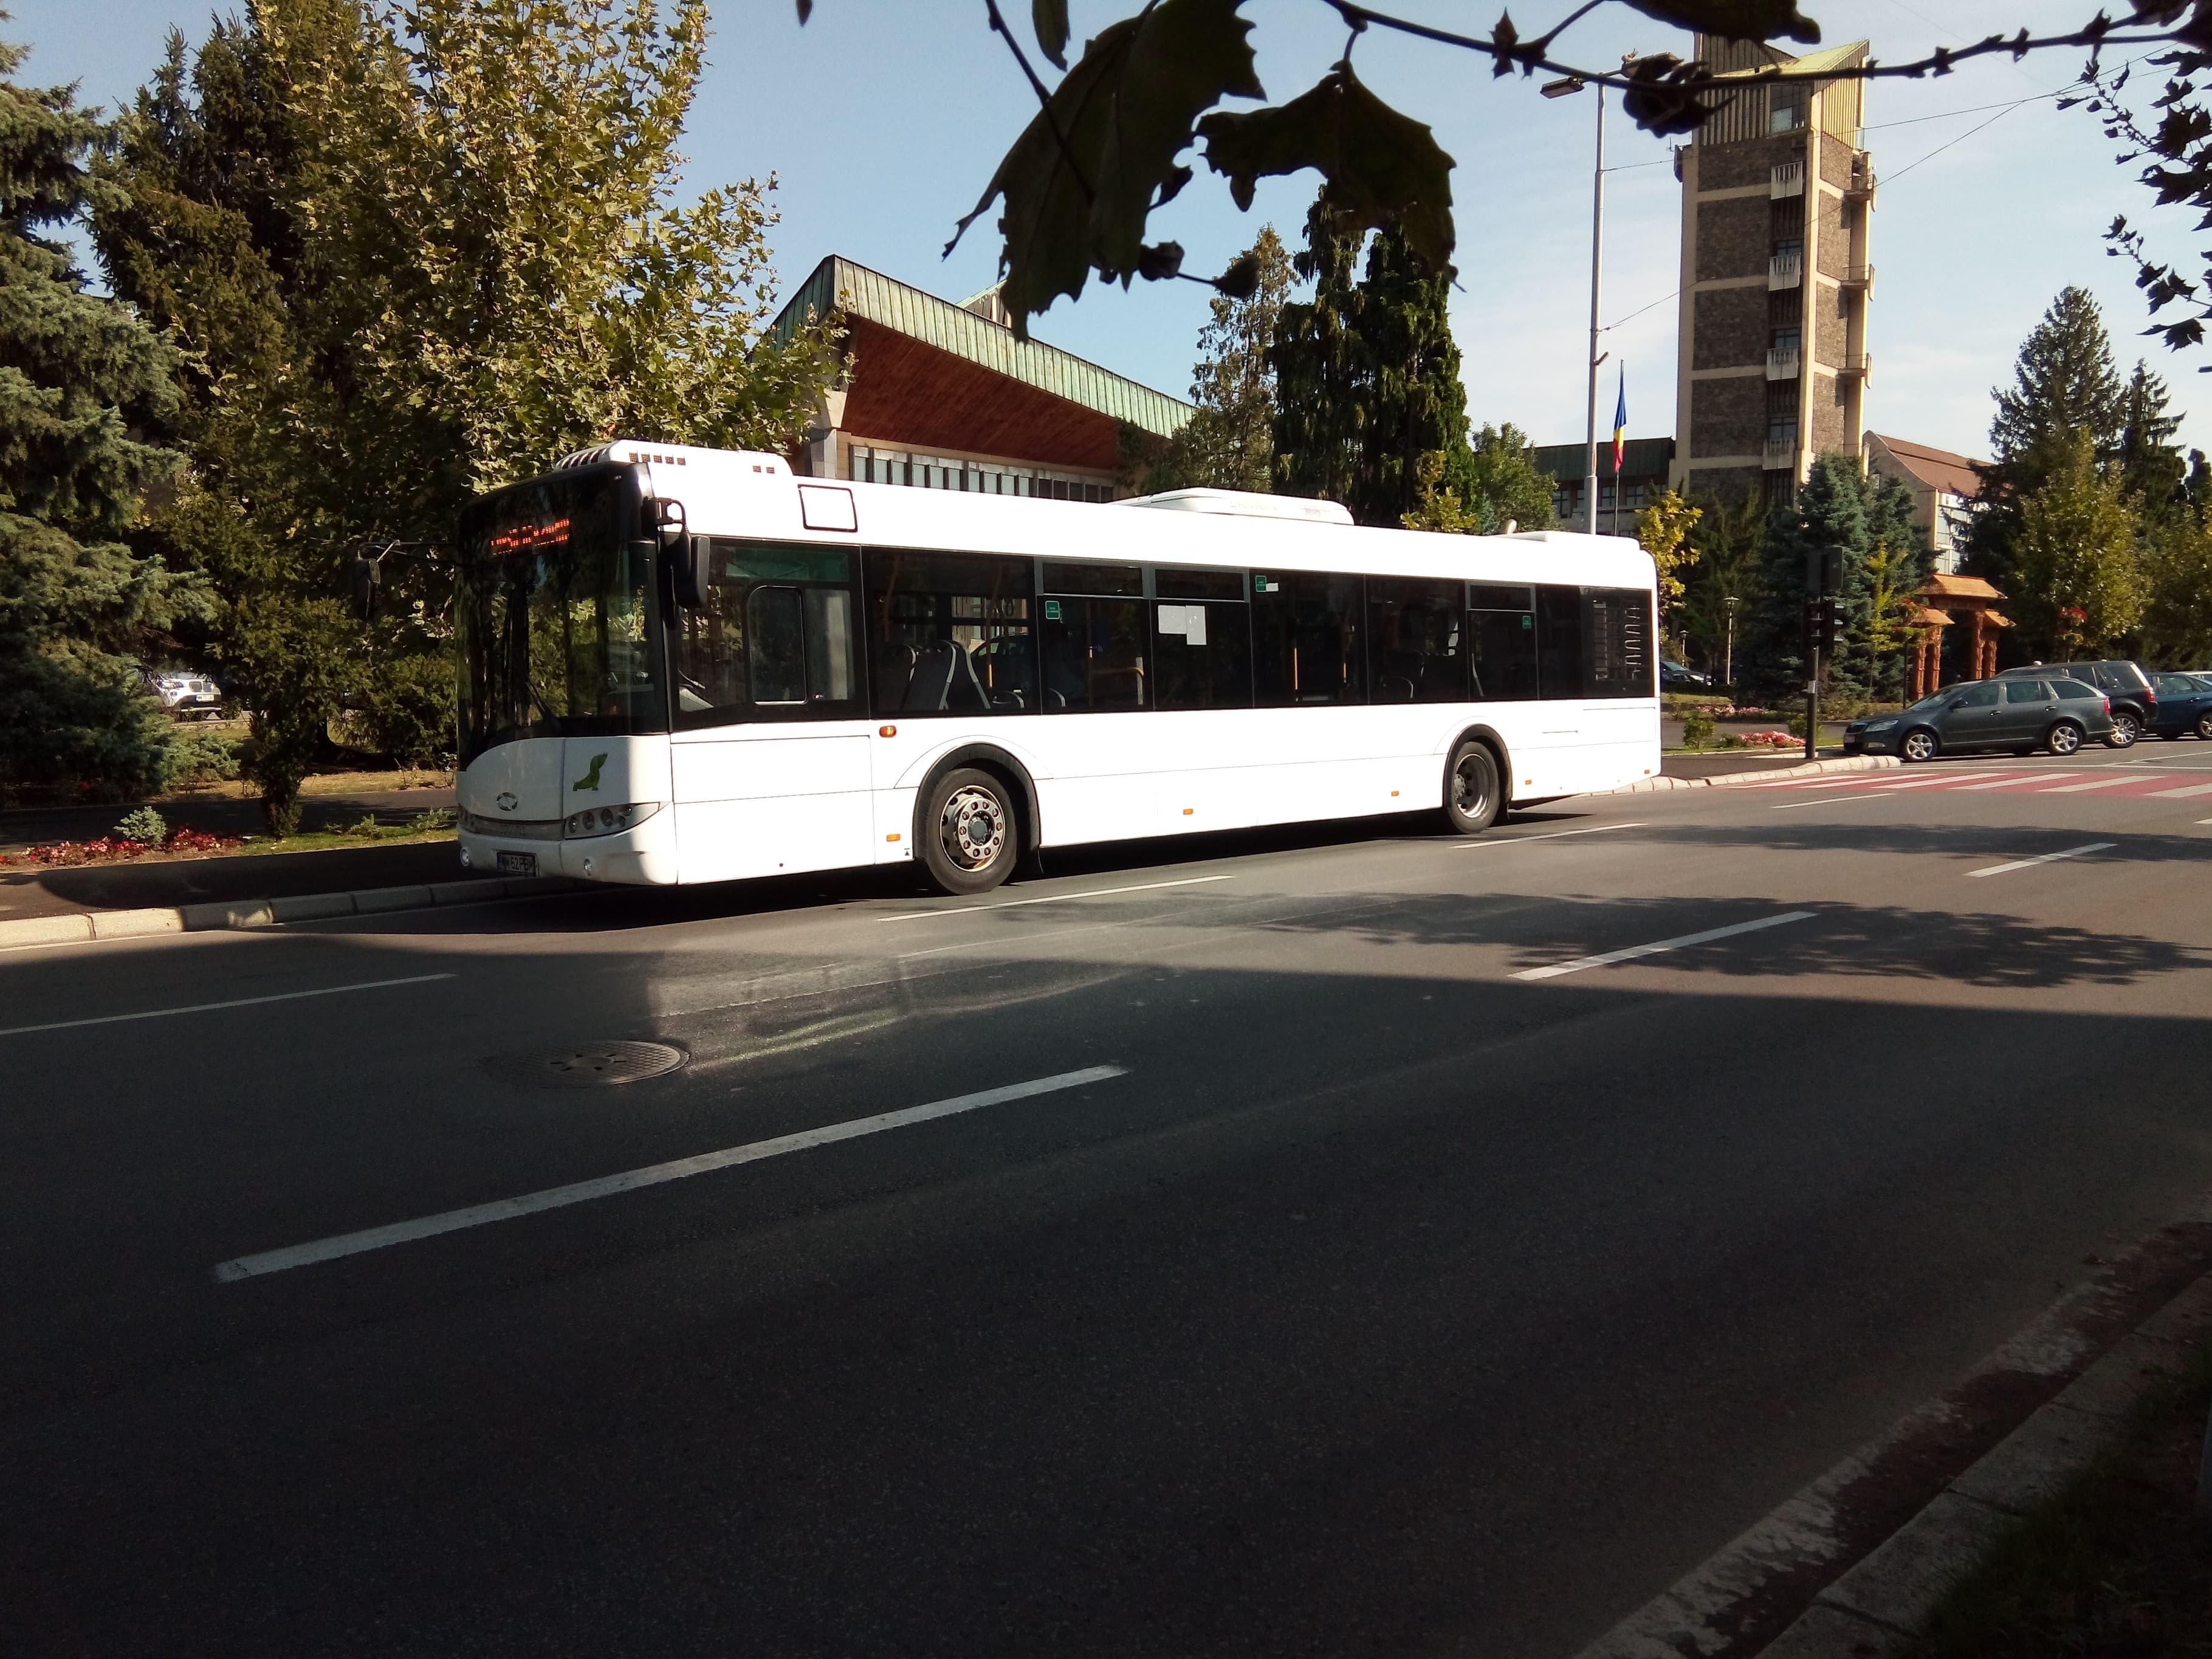 Baia Mare: O noua modalitate de plata a biletelor de autobuz URBIS (FOTO)